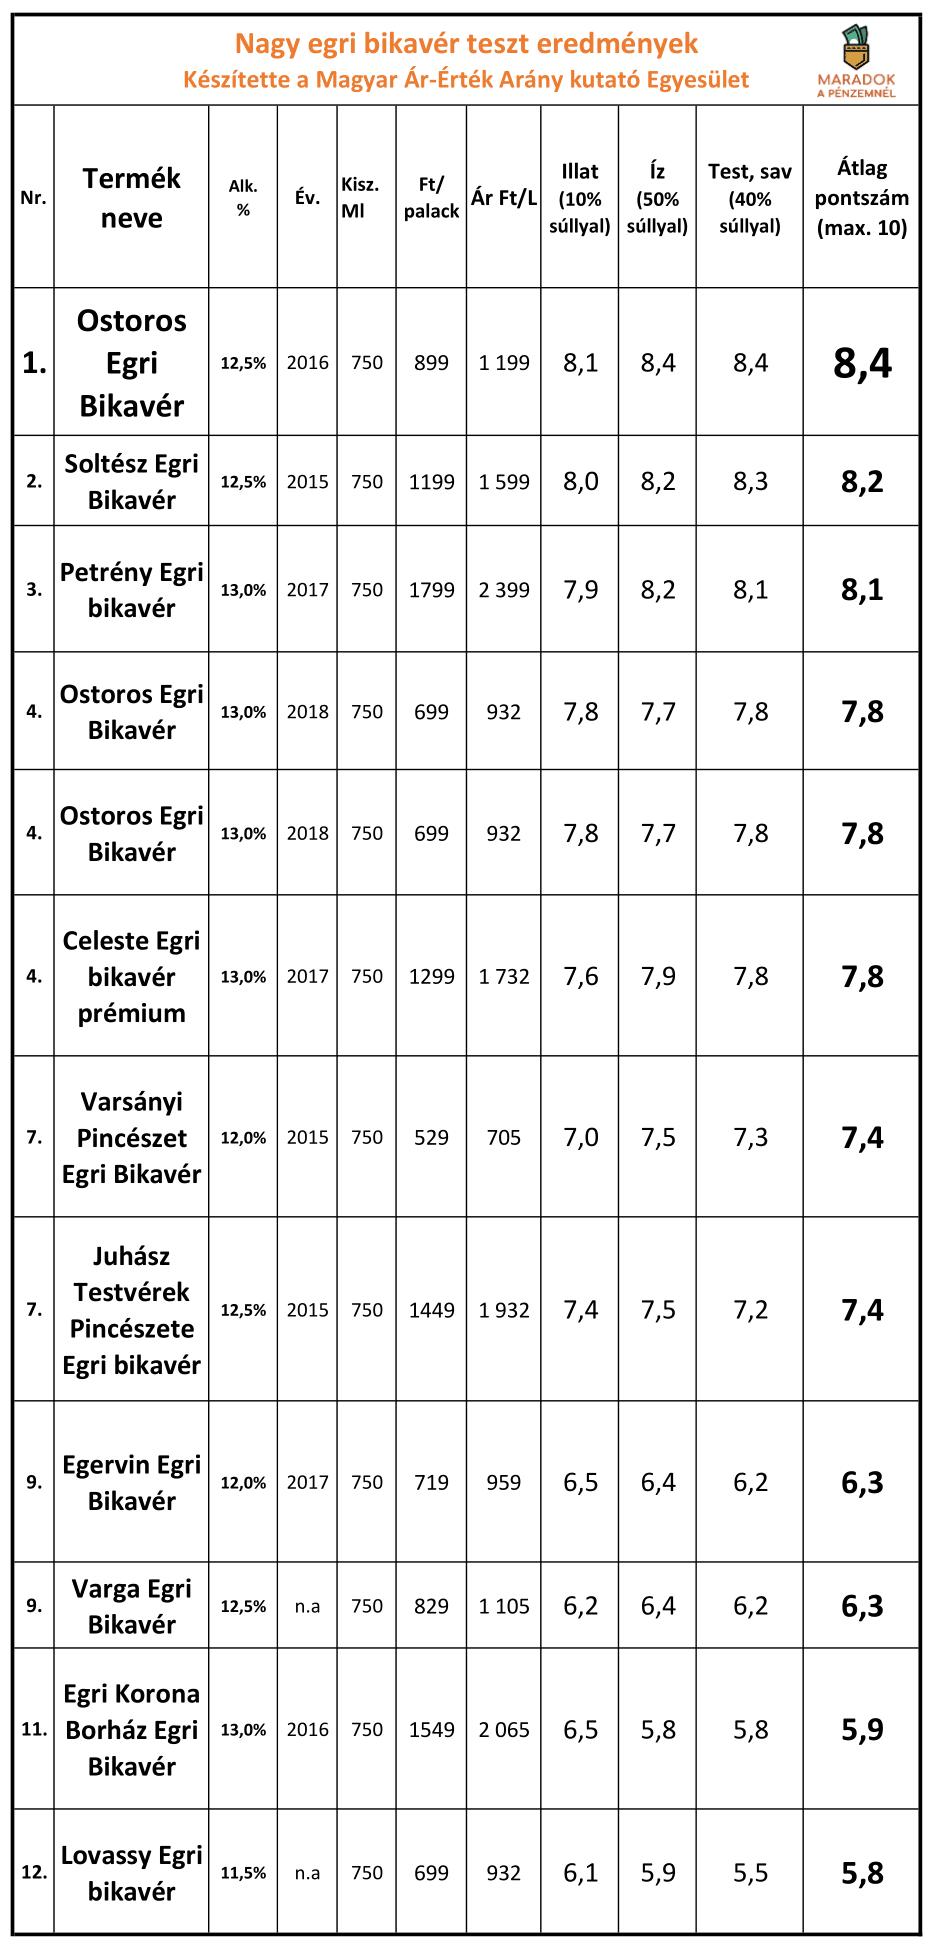 egri_bikaver_teszt-1_1.png